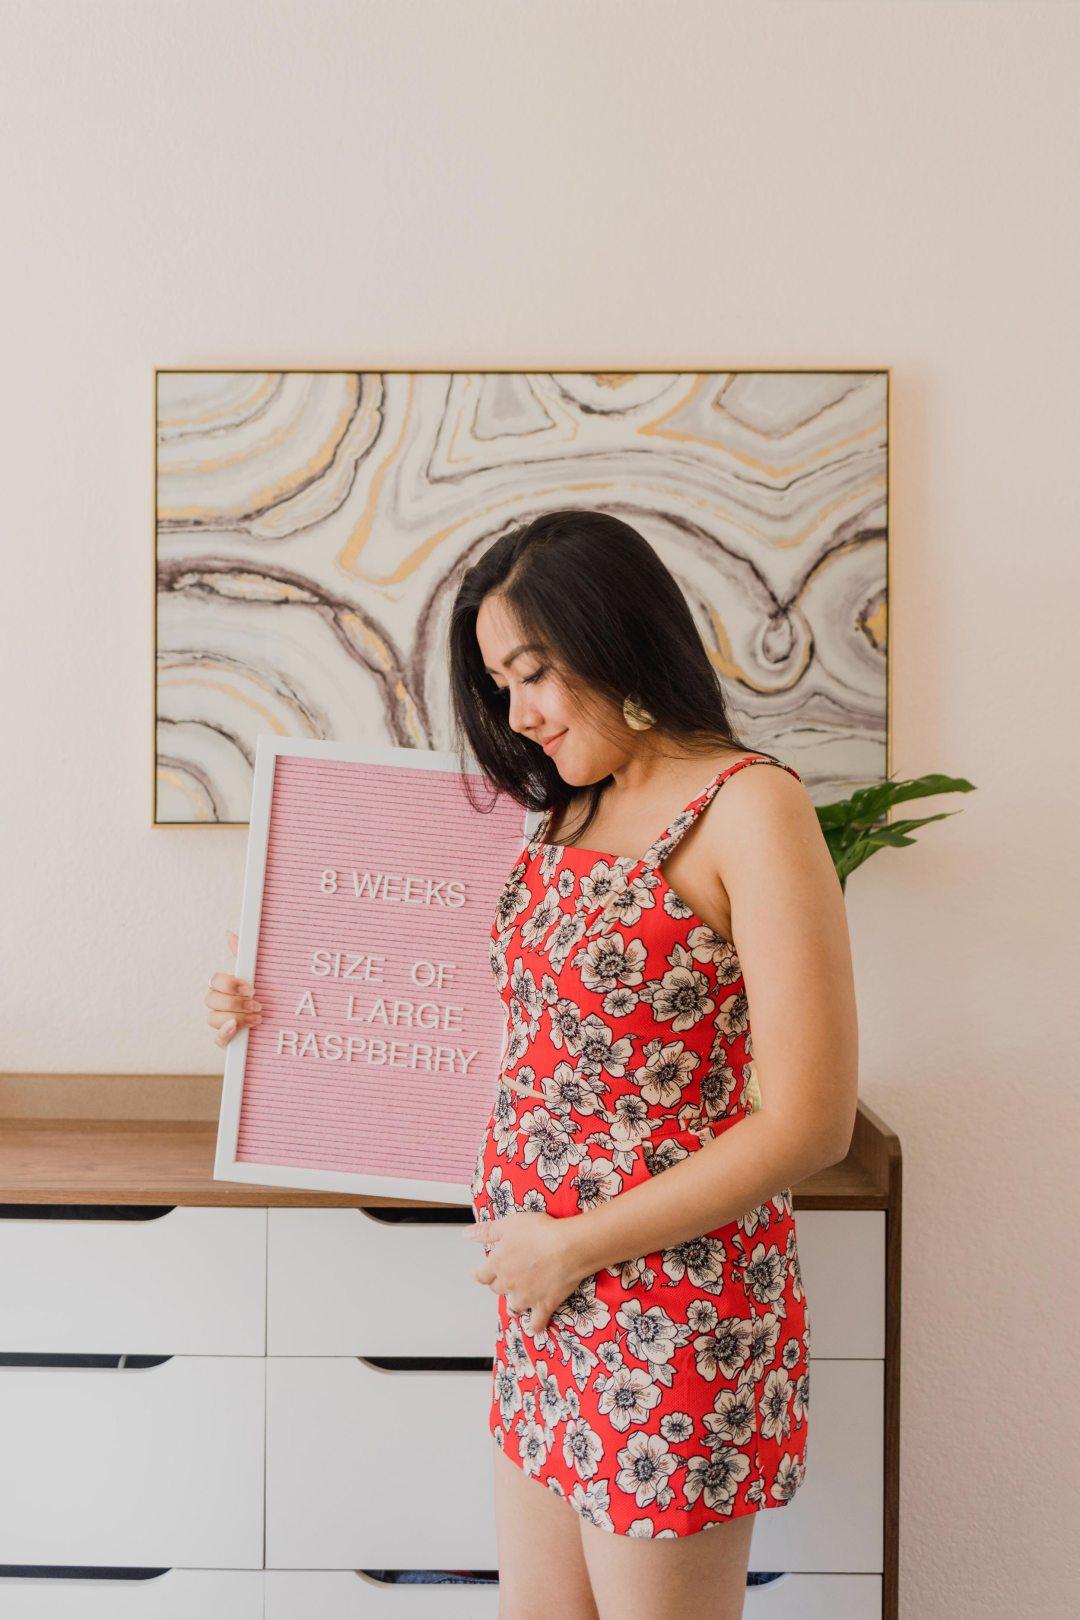 Second-pregnancy-symptomps_8-weeks-pregnant_Molly-Larsen-Blogger-Allaboutgoodvibes.com@thevibescloset-_2